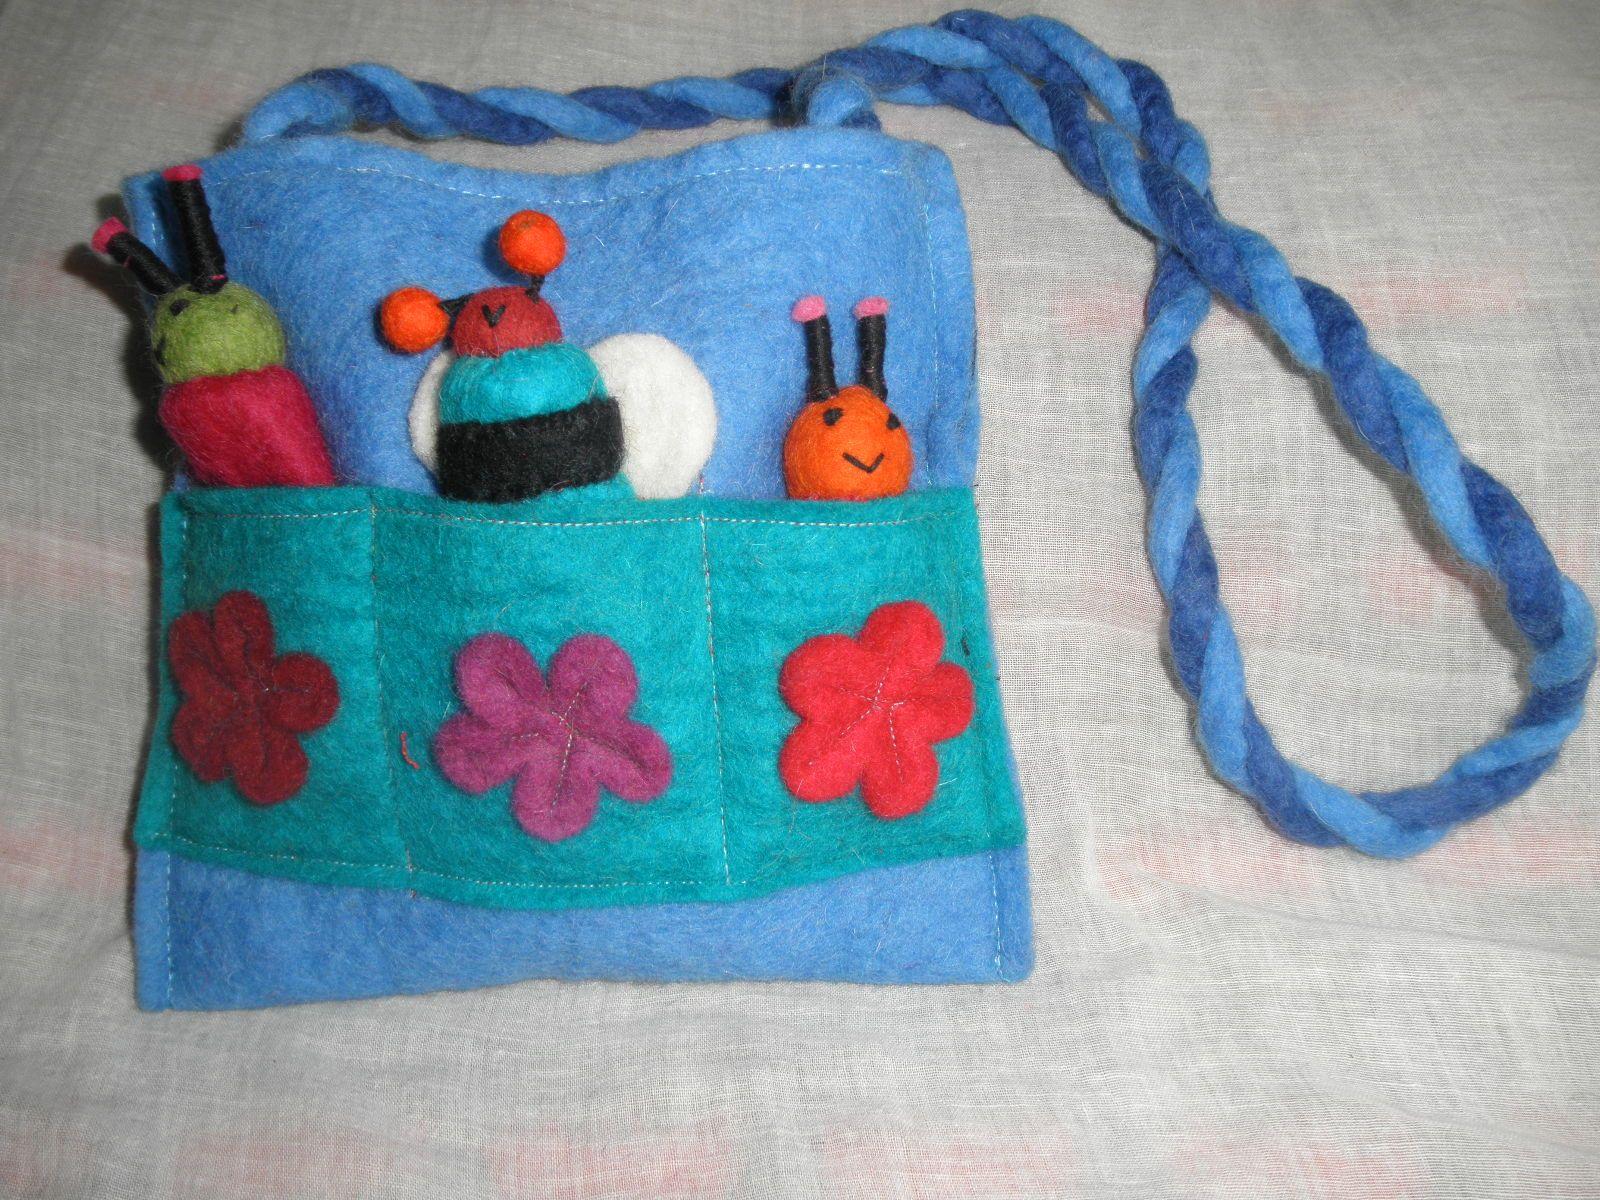 Wool Craft Ideas For Kids Part - 41: Felt Wool DIY U0026 Crafts Felt Wool Craft Handicraft Felt Craft Supplies Felt  Craft Design Felt Craft Patterns Felt Craft Ideas Felt Craft For Kids Felt  Craft ...